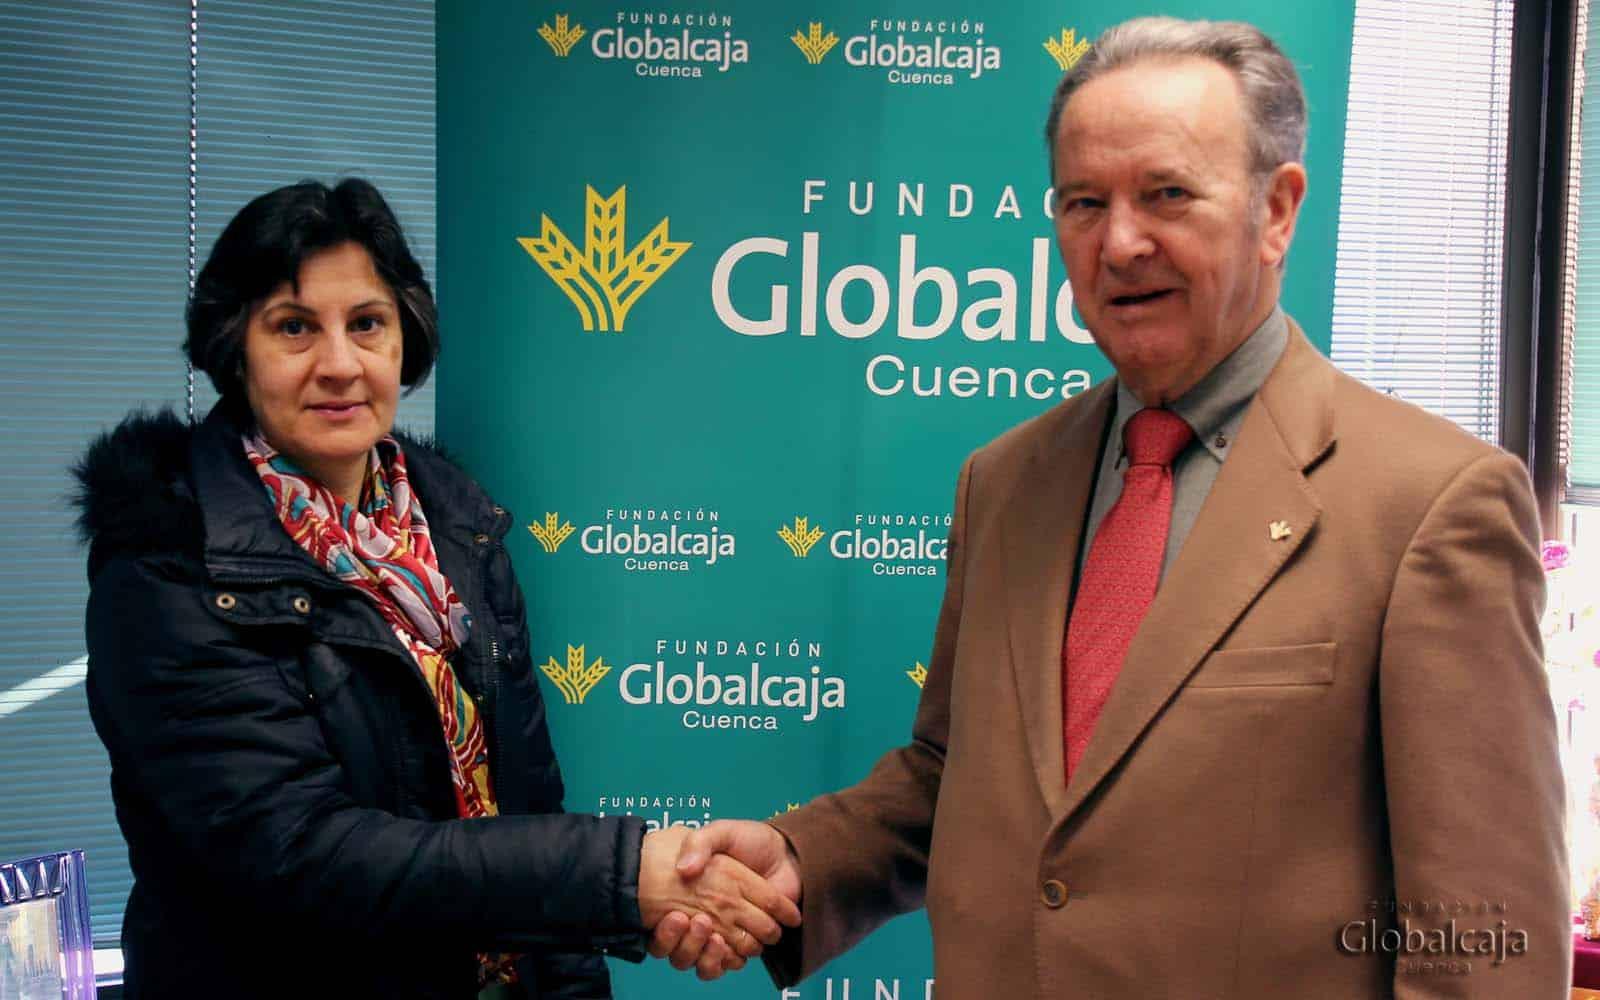 https://blog.globalcaja.es/wp-content/uploads/2016/01/caritas-convenio-2.jpg